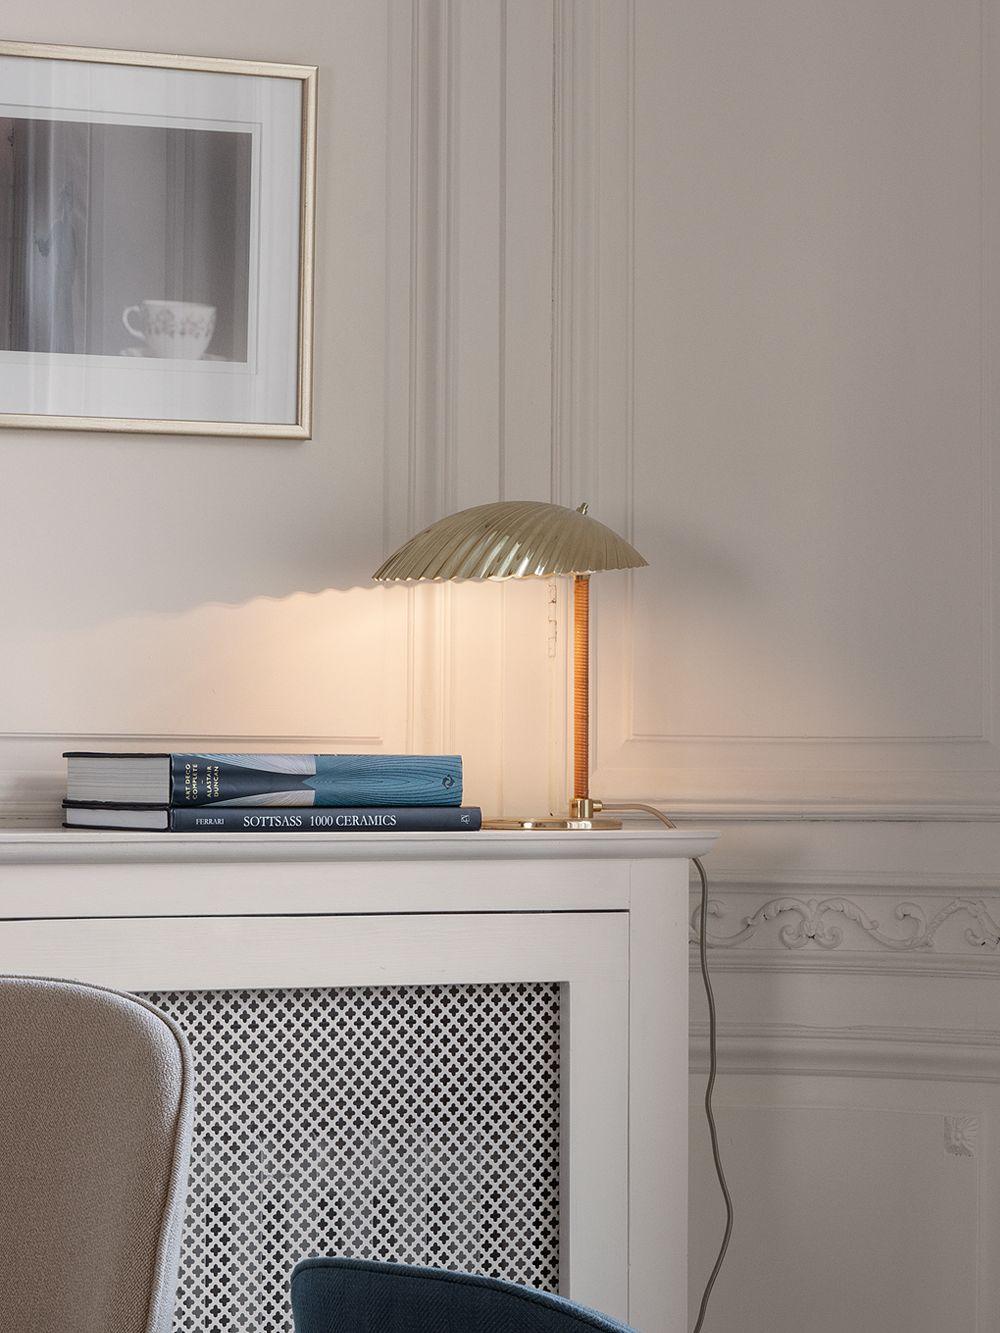 Gubi's Tynell 5321 table lamp in living room decor.